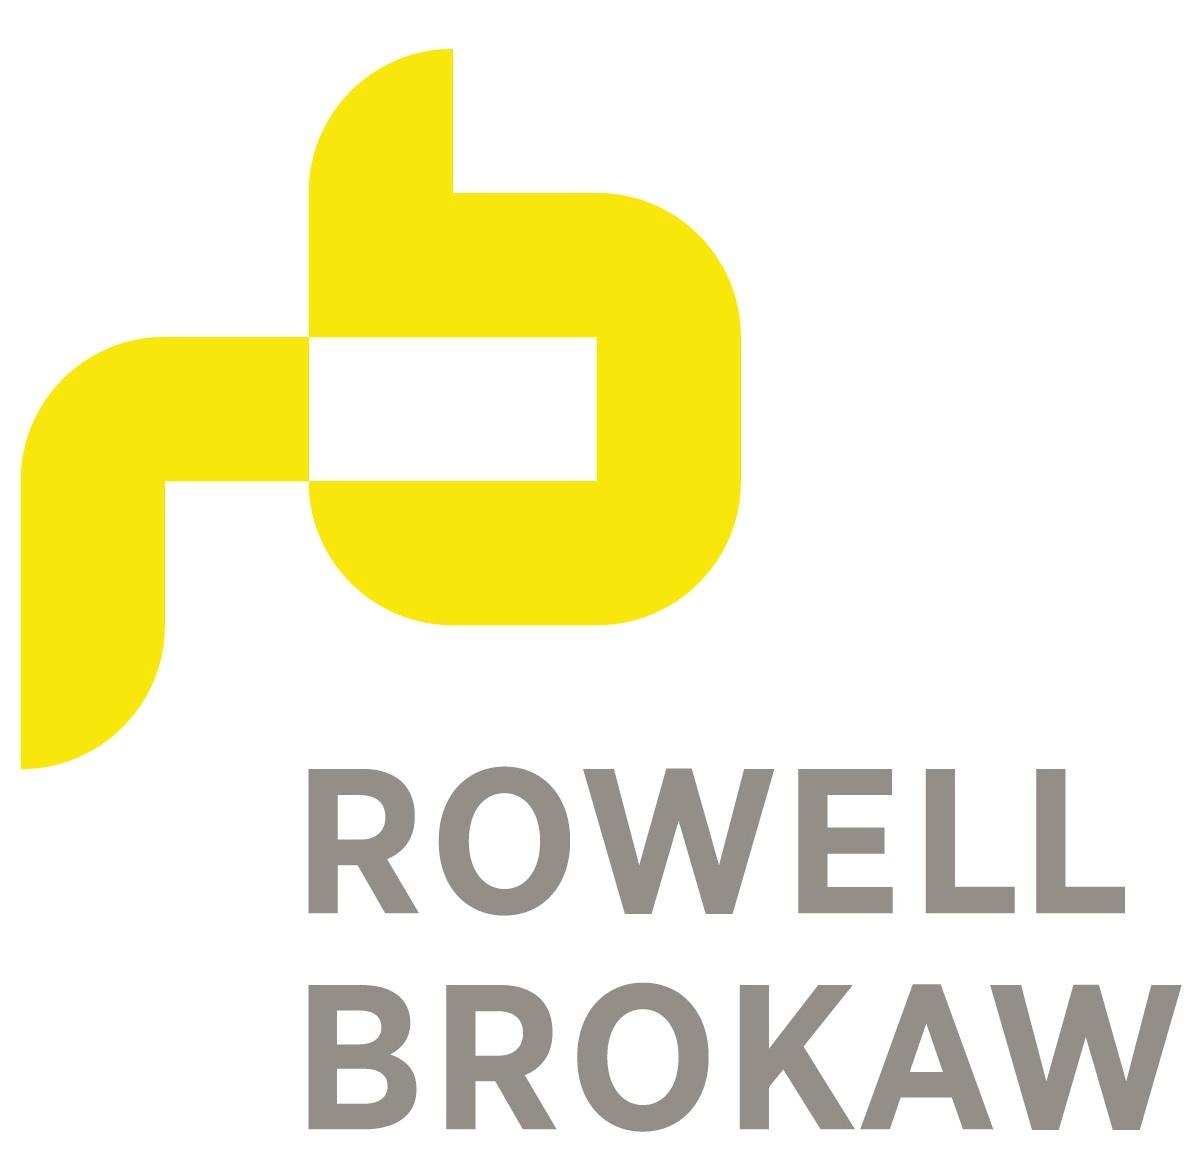 rowell-brokaw-logo.jpg